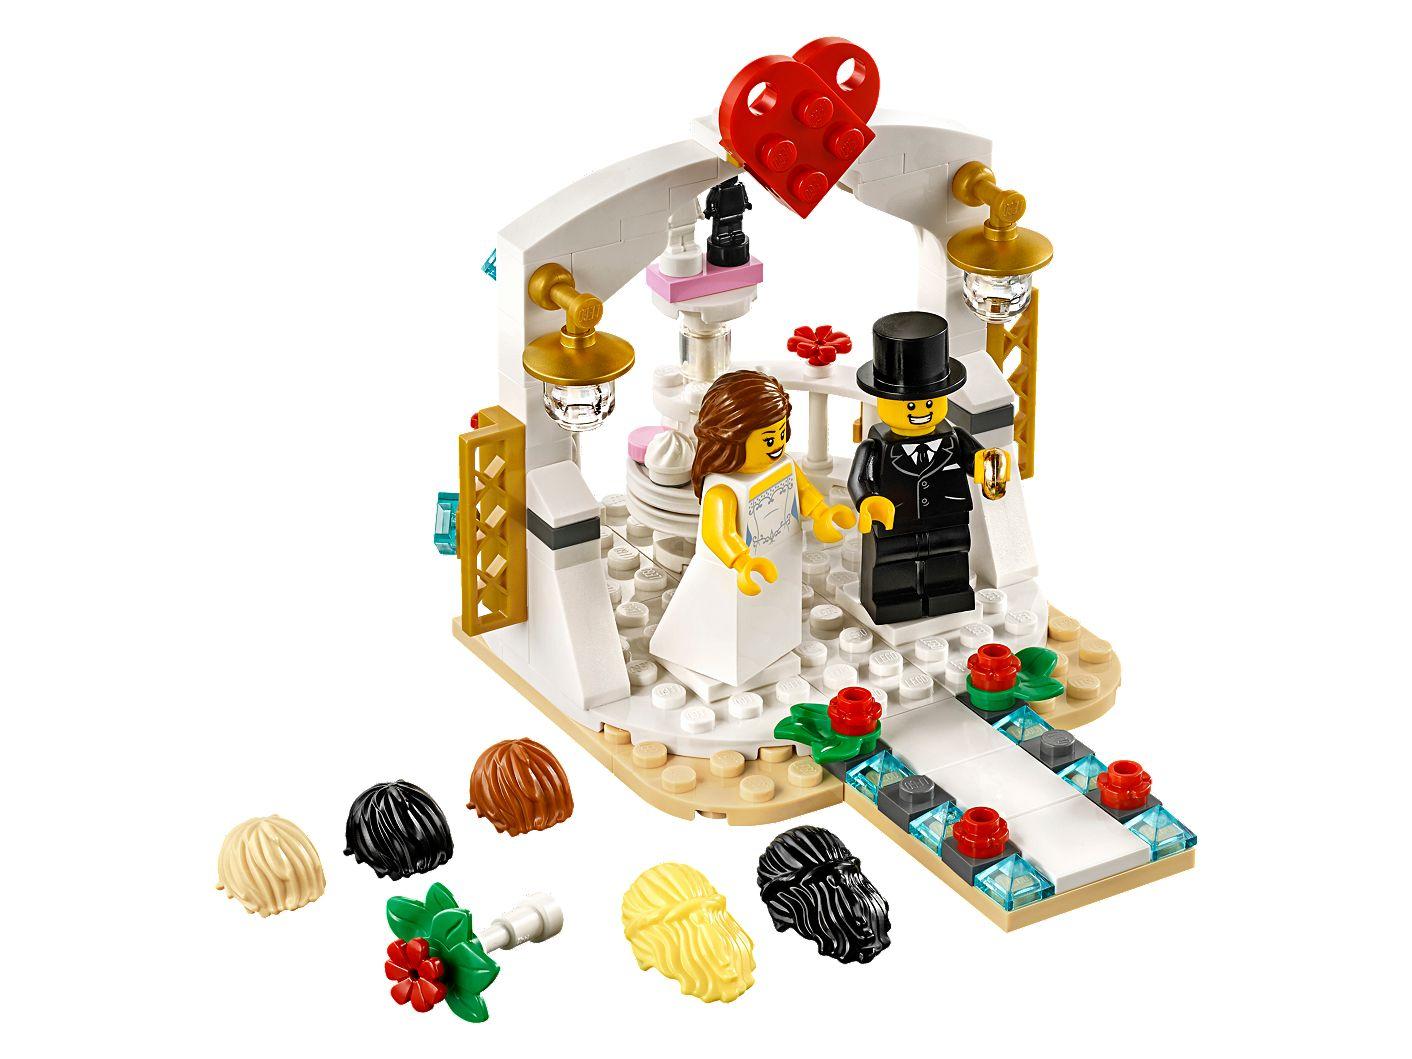 *NEW* Lego CHRISTMAS ORNAMENT WEDDING 2019 Minifig BRIDE /& GROOM